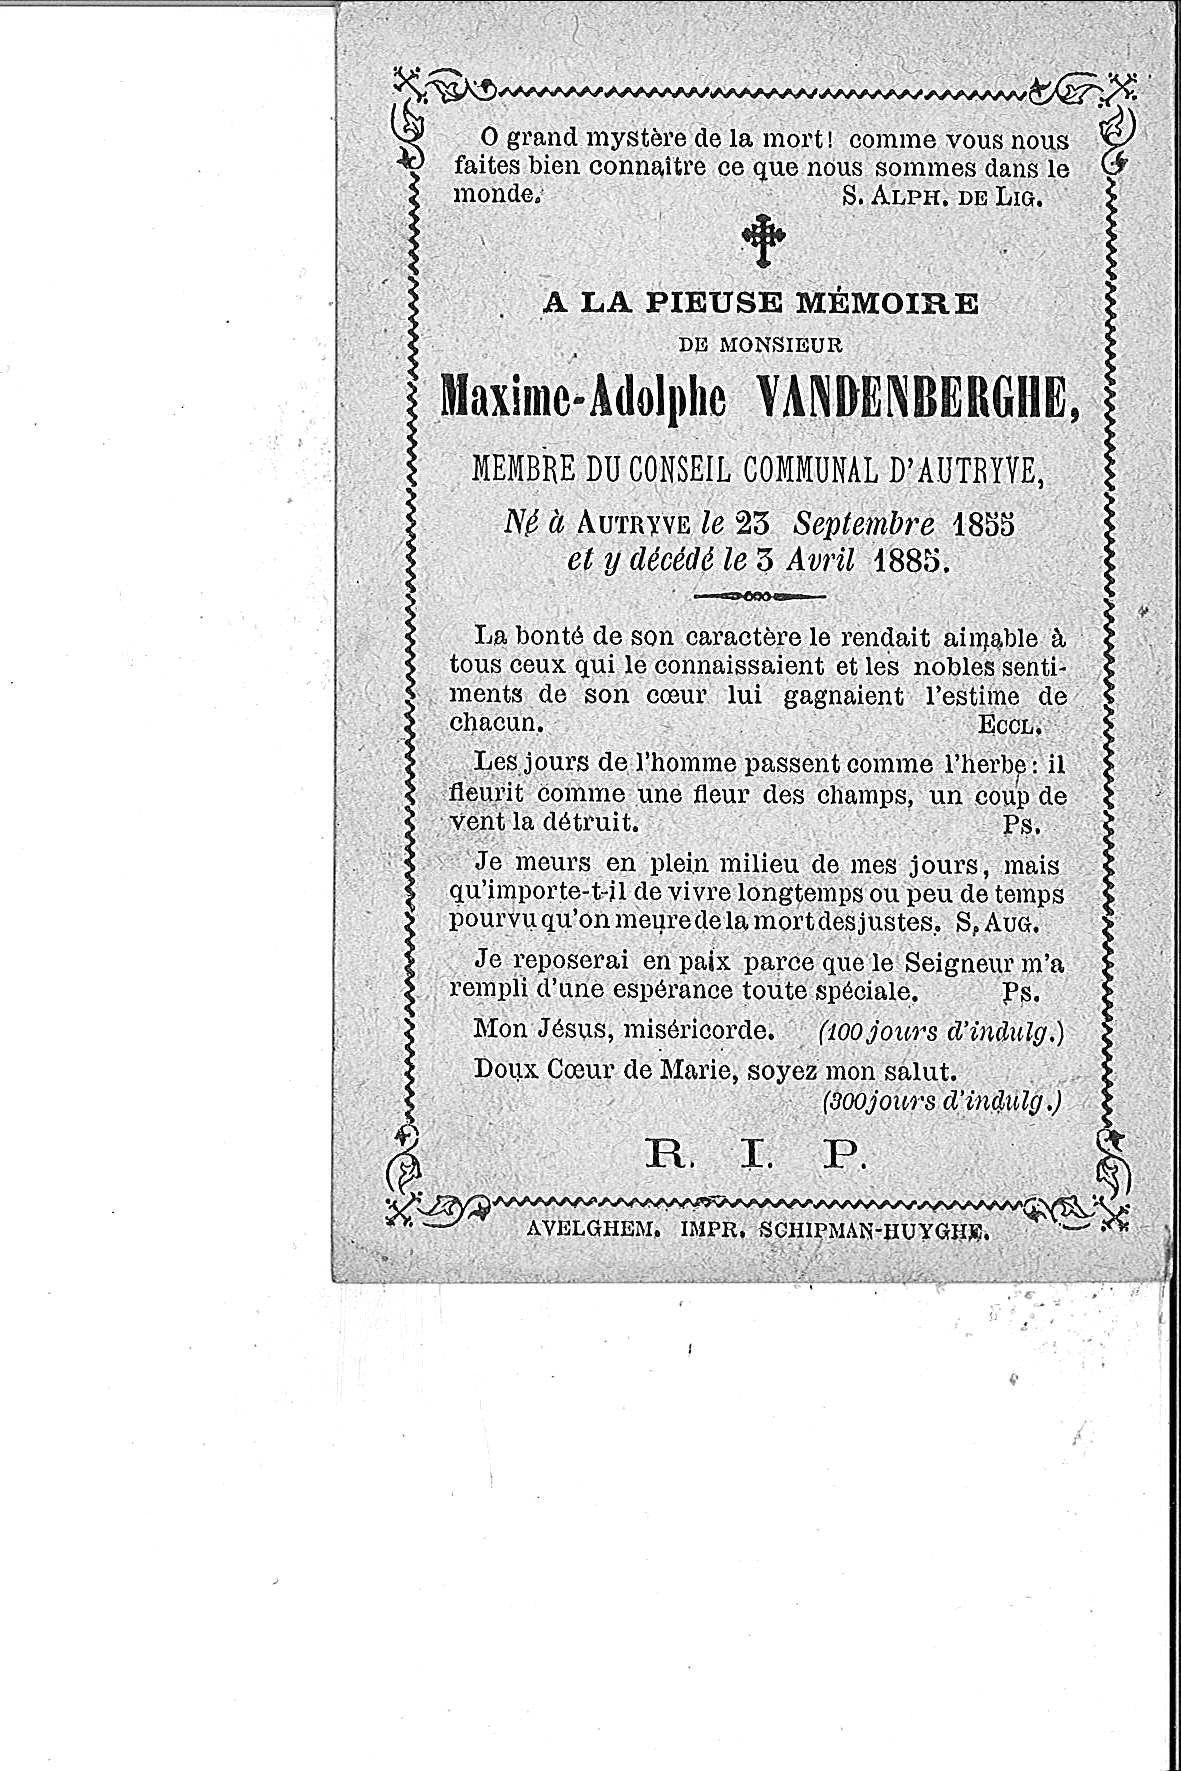 Maxime_Adolphe(1885)20150804103713_00001.jpg